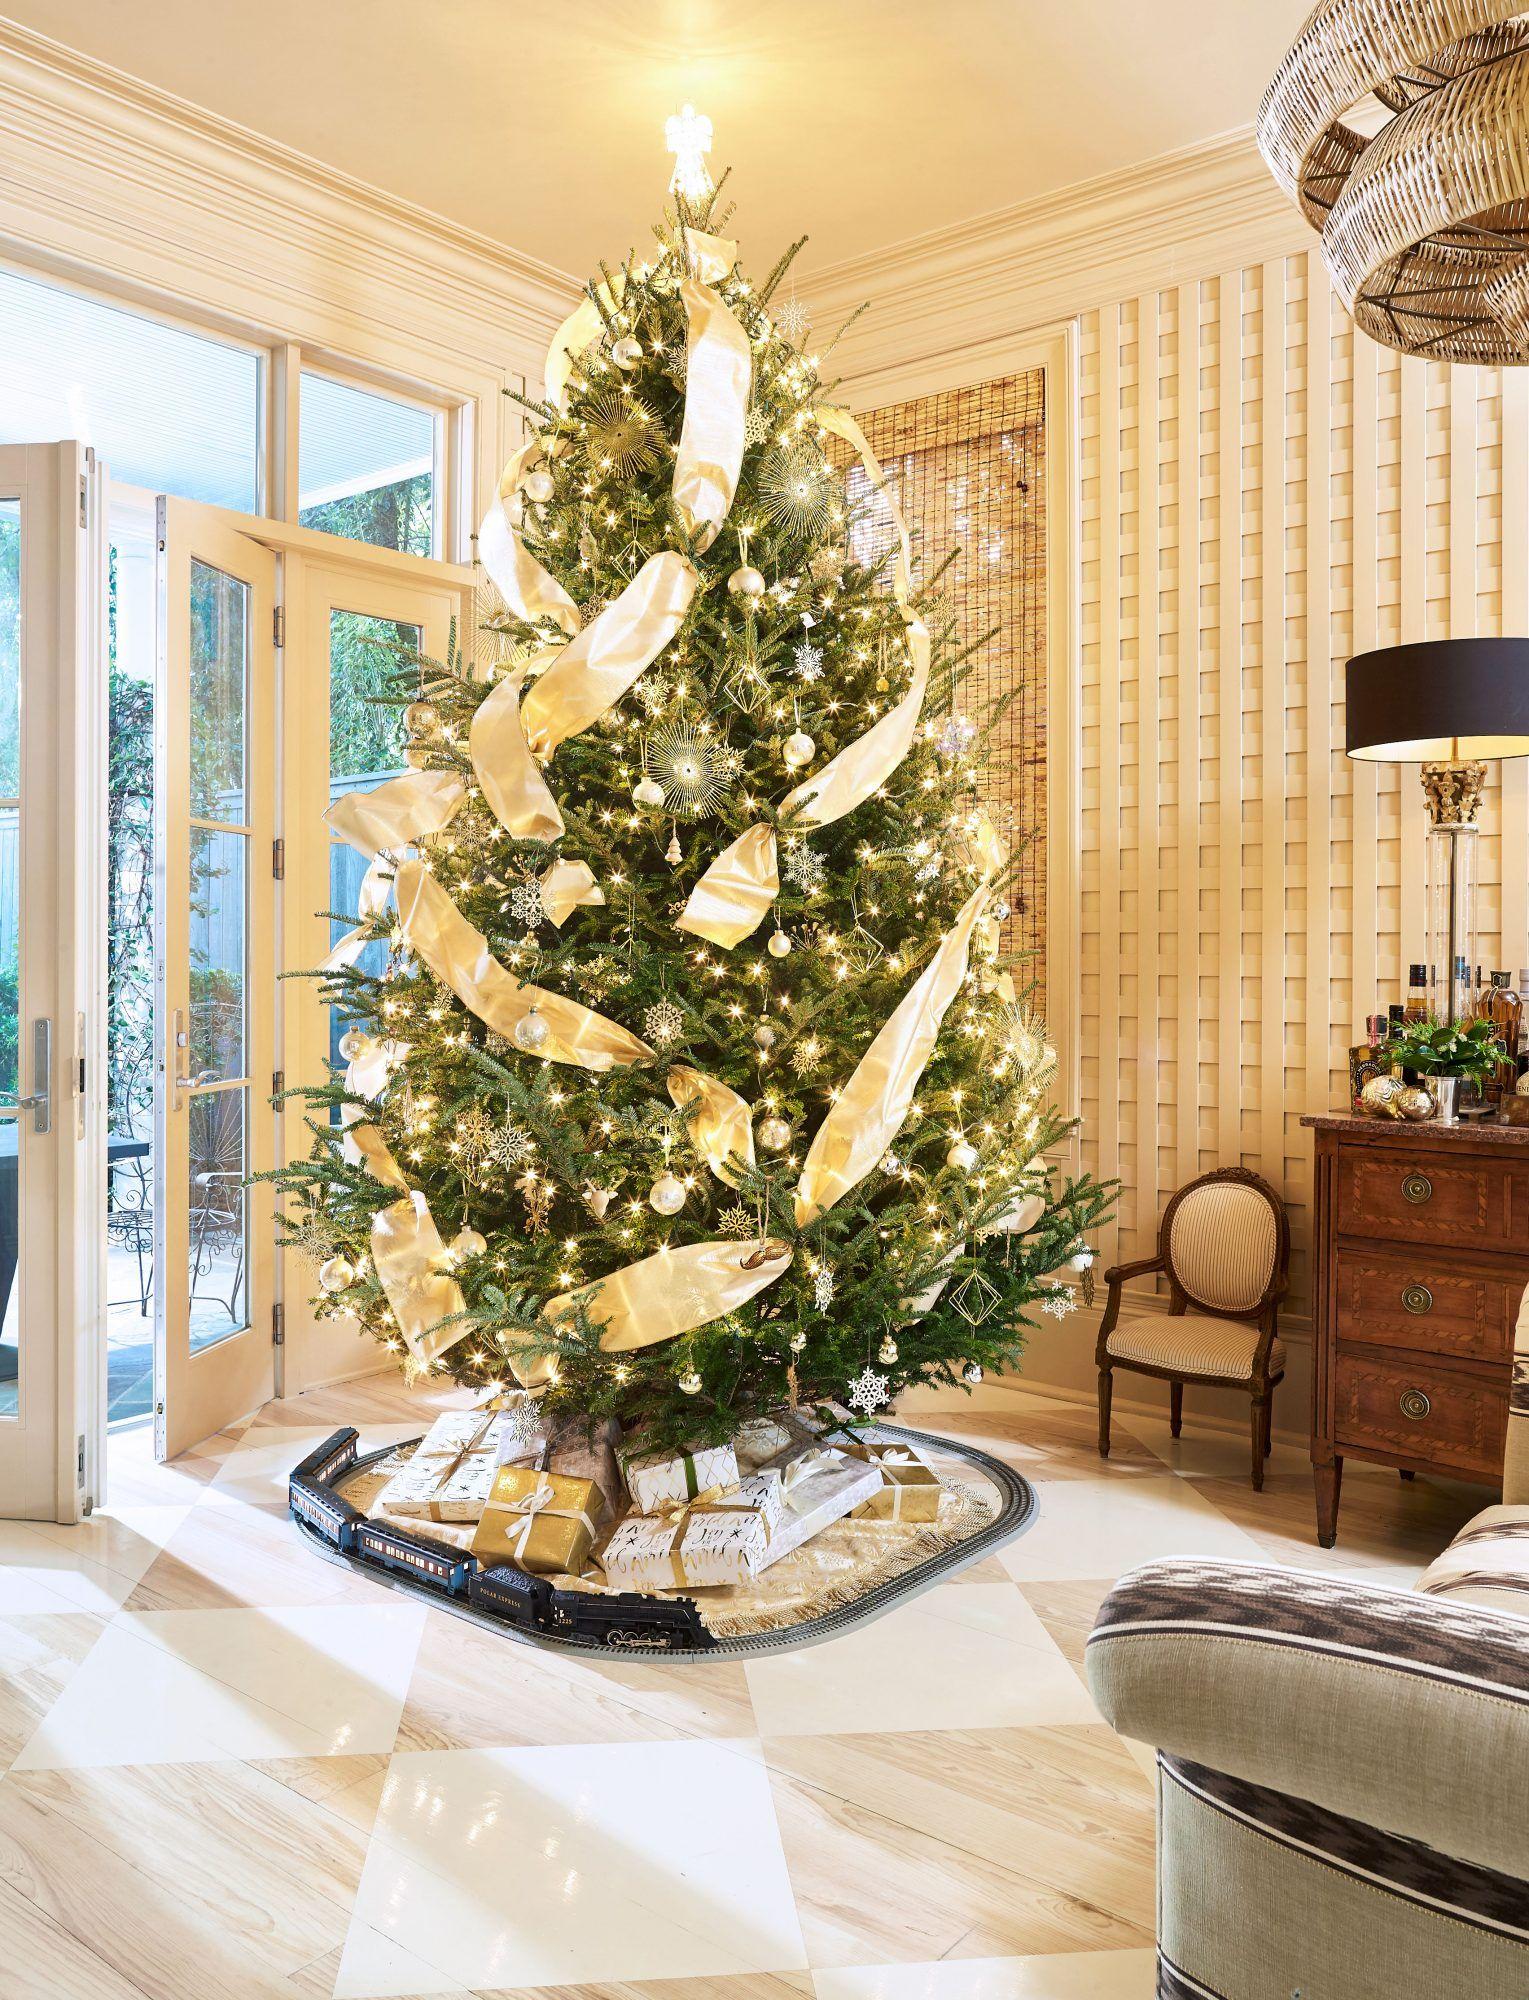 Cece Calhoun's New Orleans Home Sparkles During the